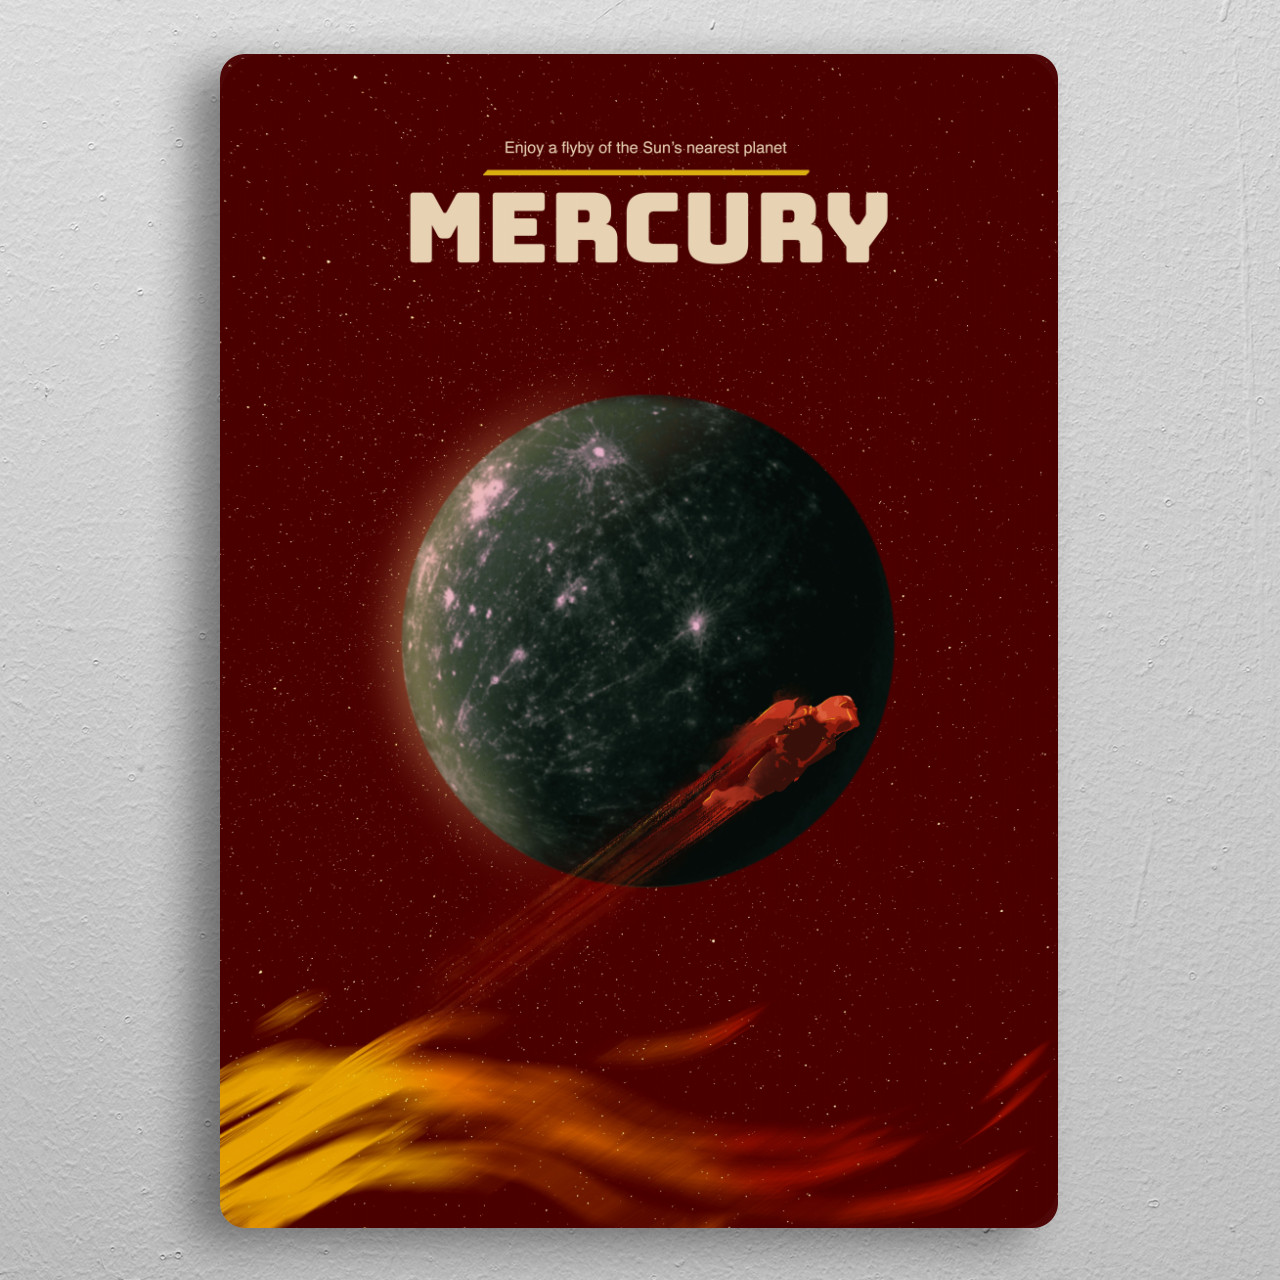 Mercury pocket-size metal print from Black box